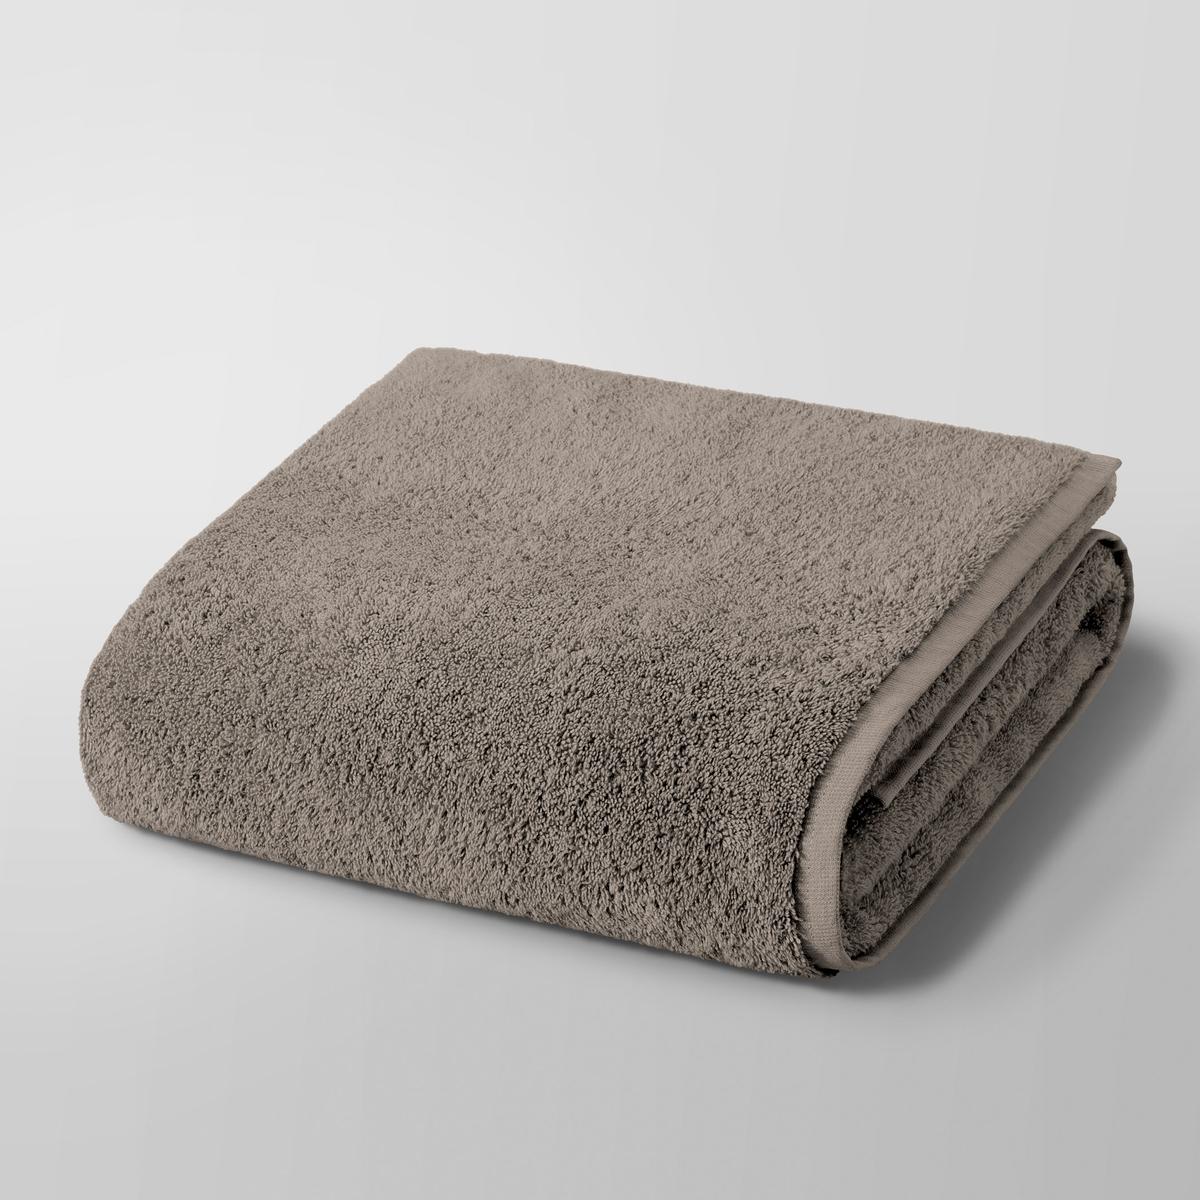 Полотенце для душа макси Gilbear, 100% хлопок 3 рукавицы банные gilbear из 100% хлопка